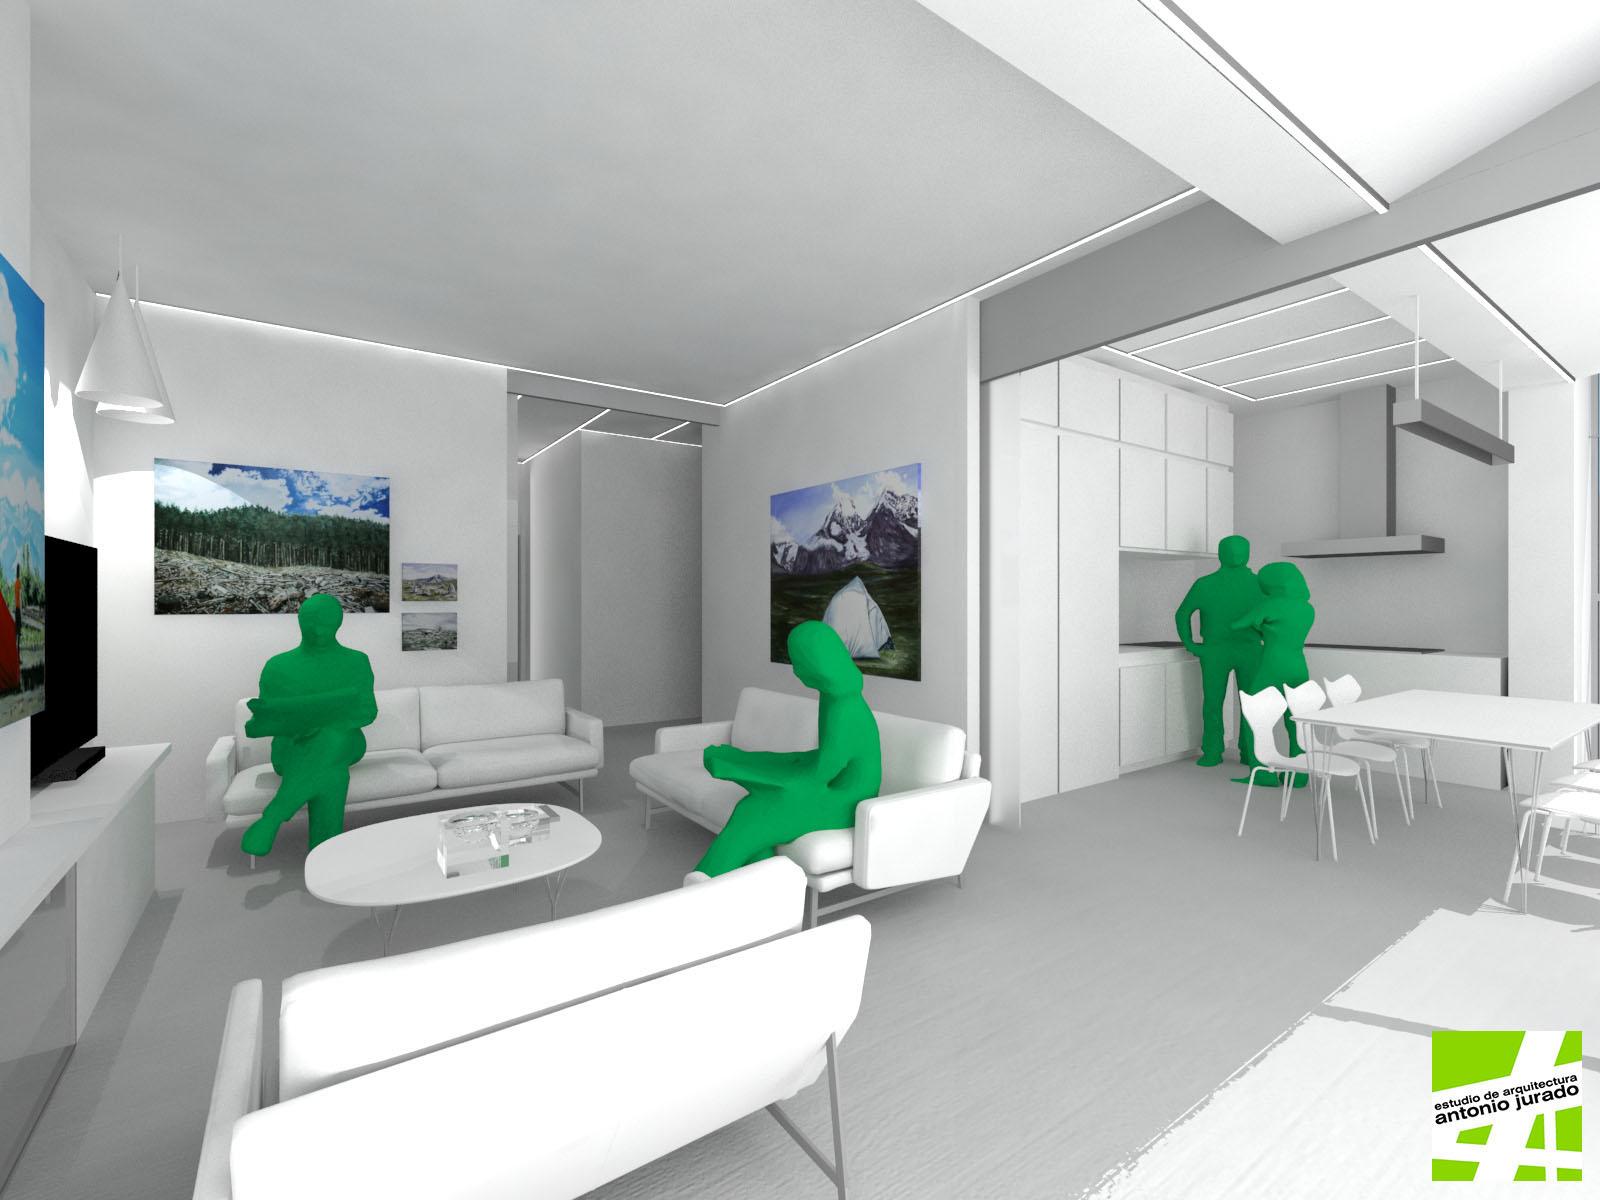 casa-ra-house-torrox-malaga-antonio-jurado-arquitecto-04